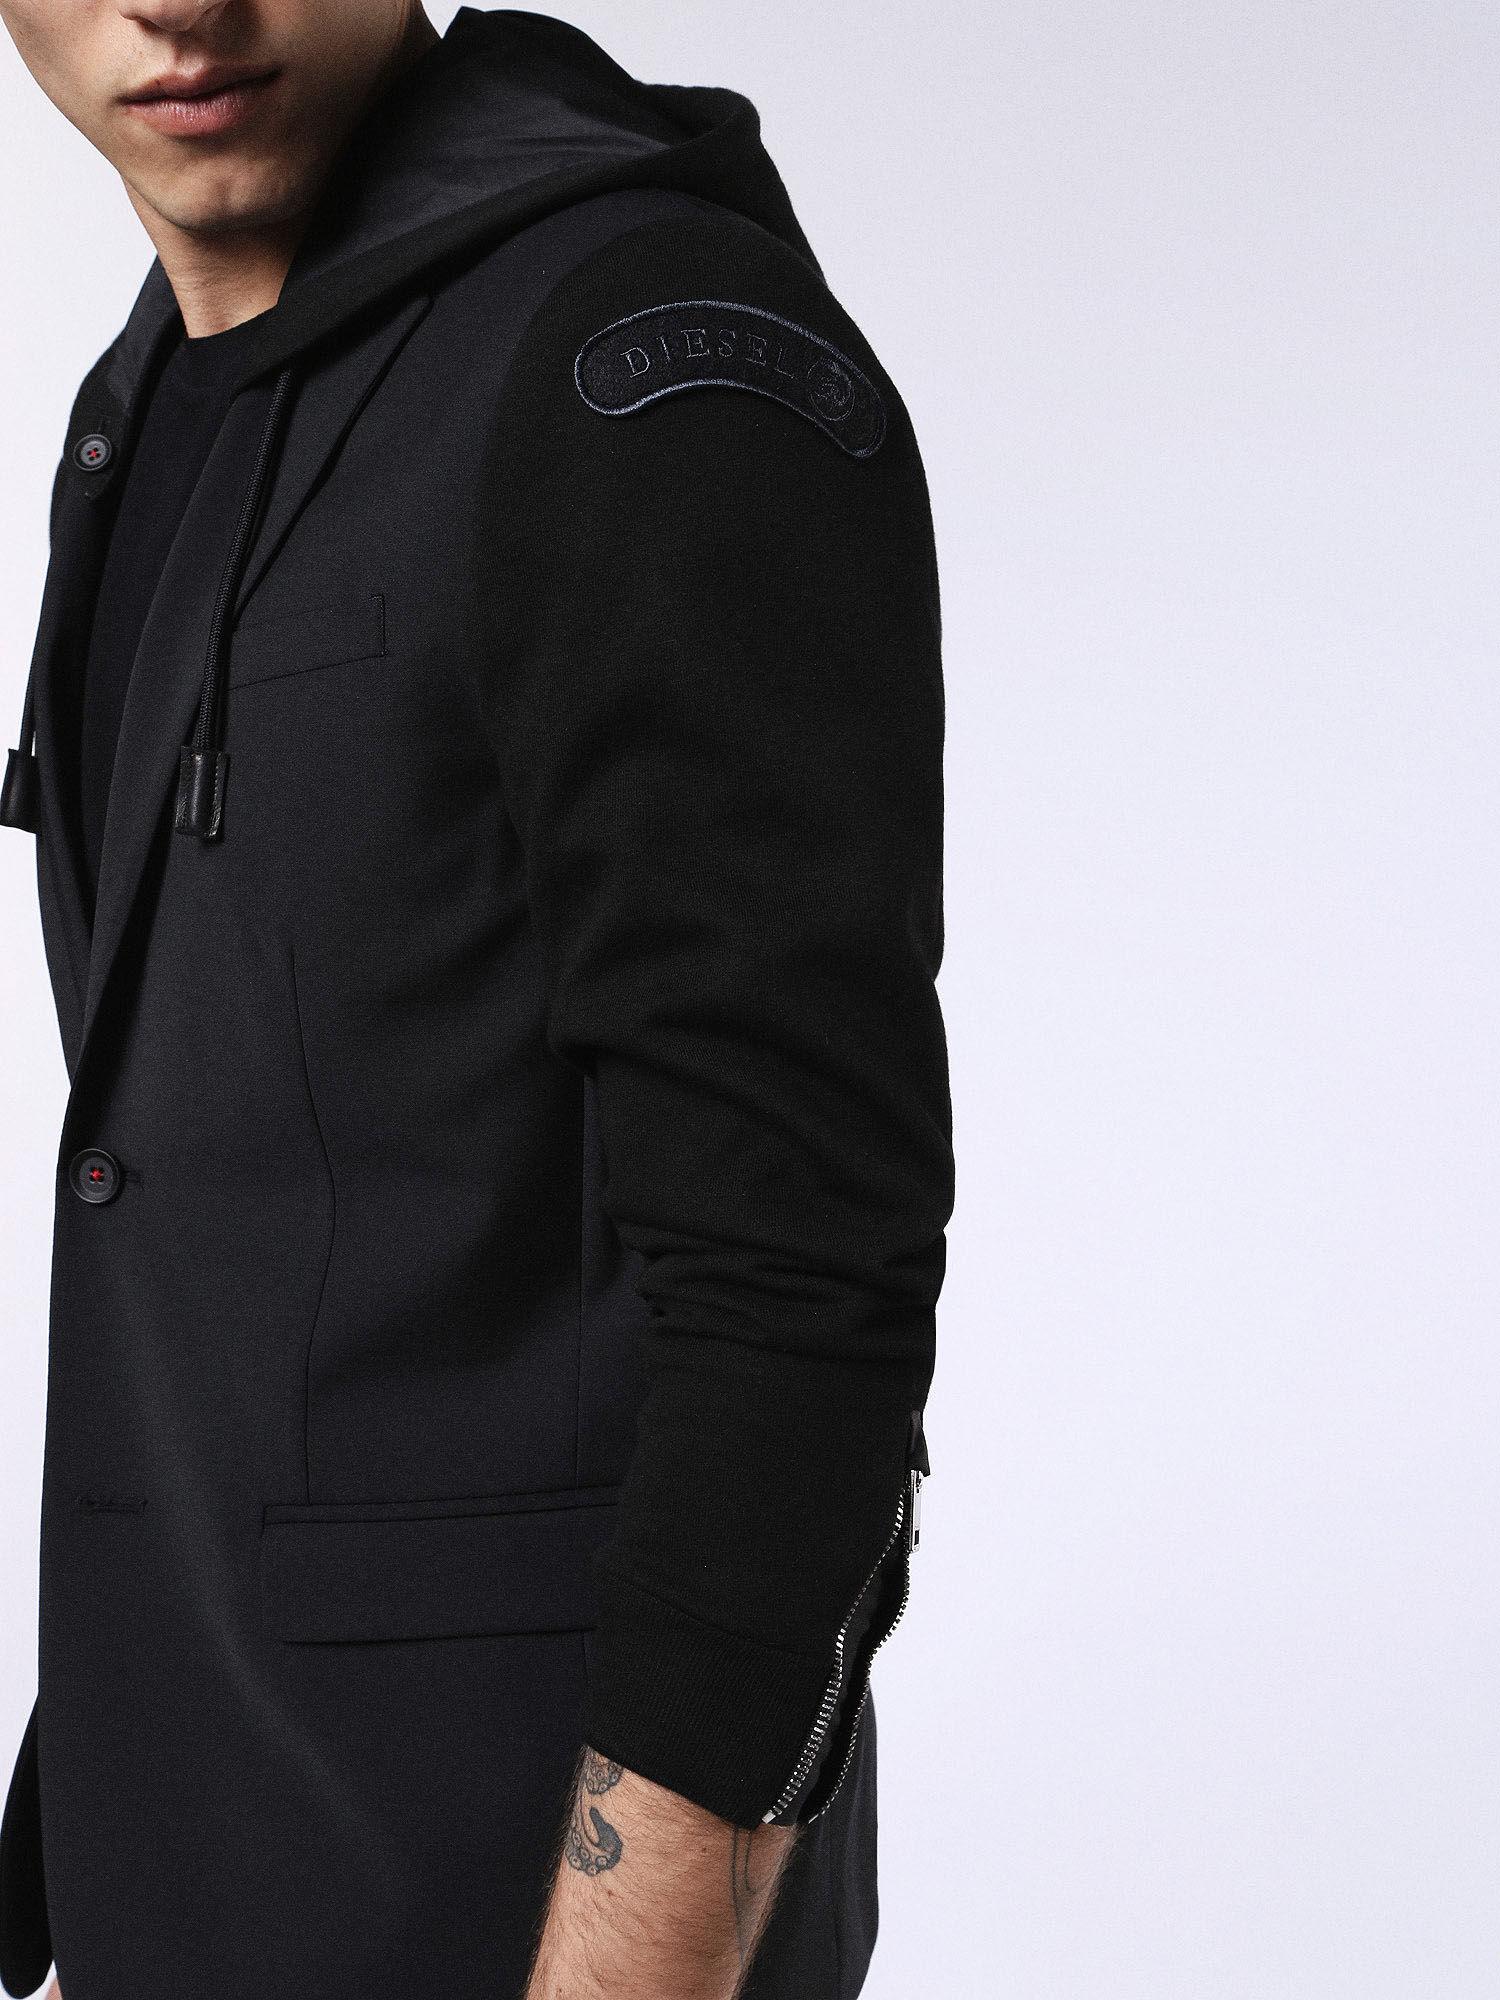 00S7S00WAPF Jackets Man DVL-BLAZER-HOOD-RE by Diesel Black